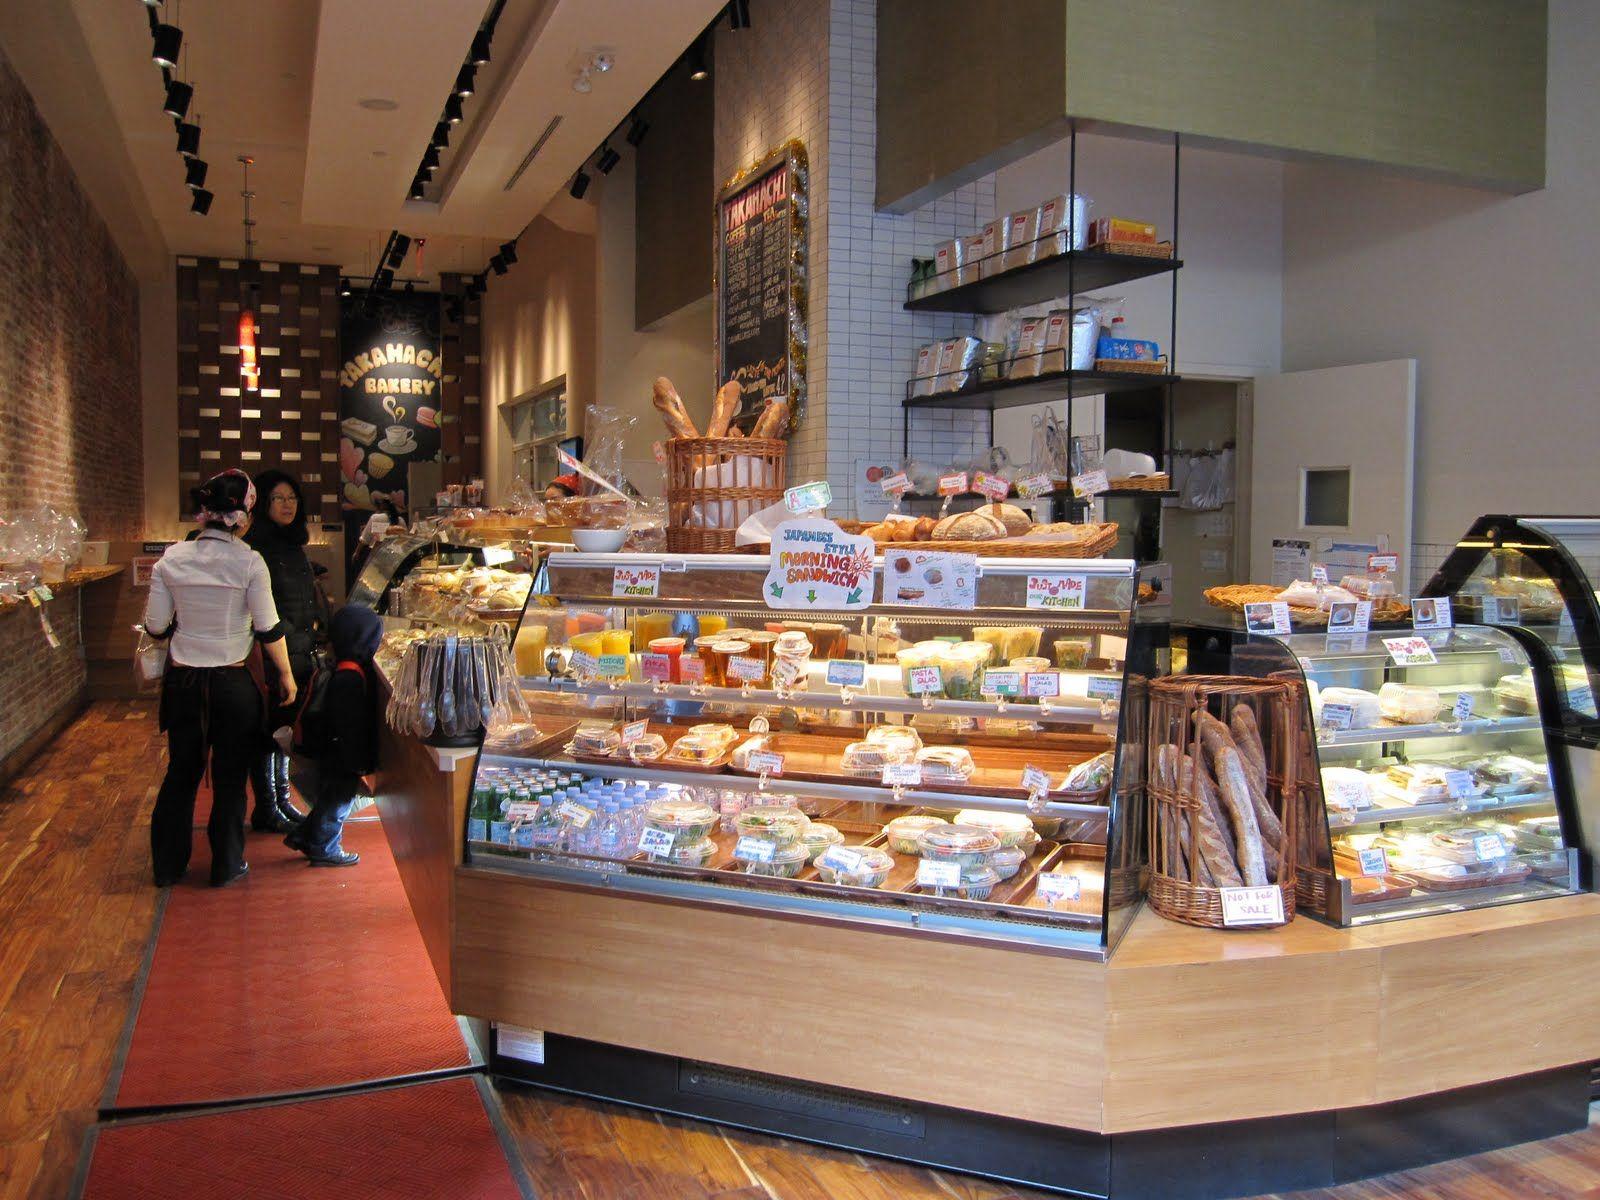 takahachi bakery, manhattan Bakery new york, Interior, Dwell